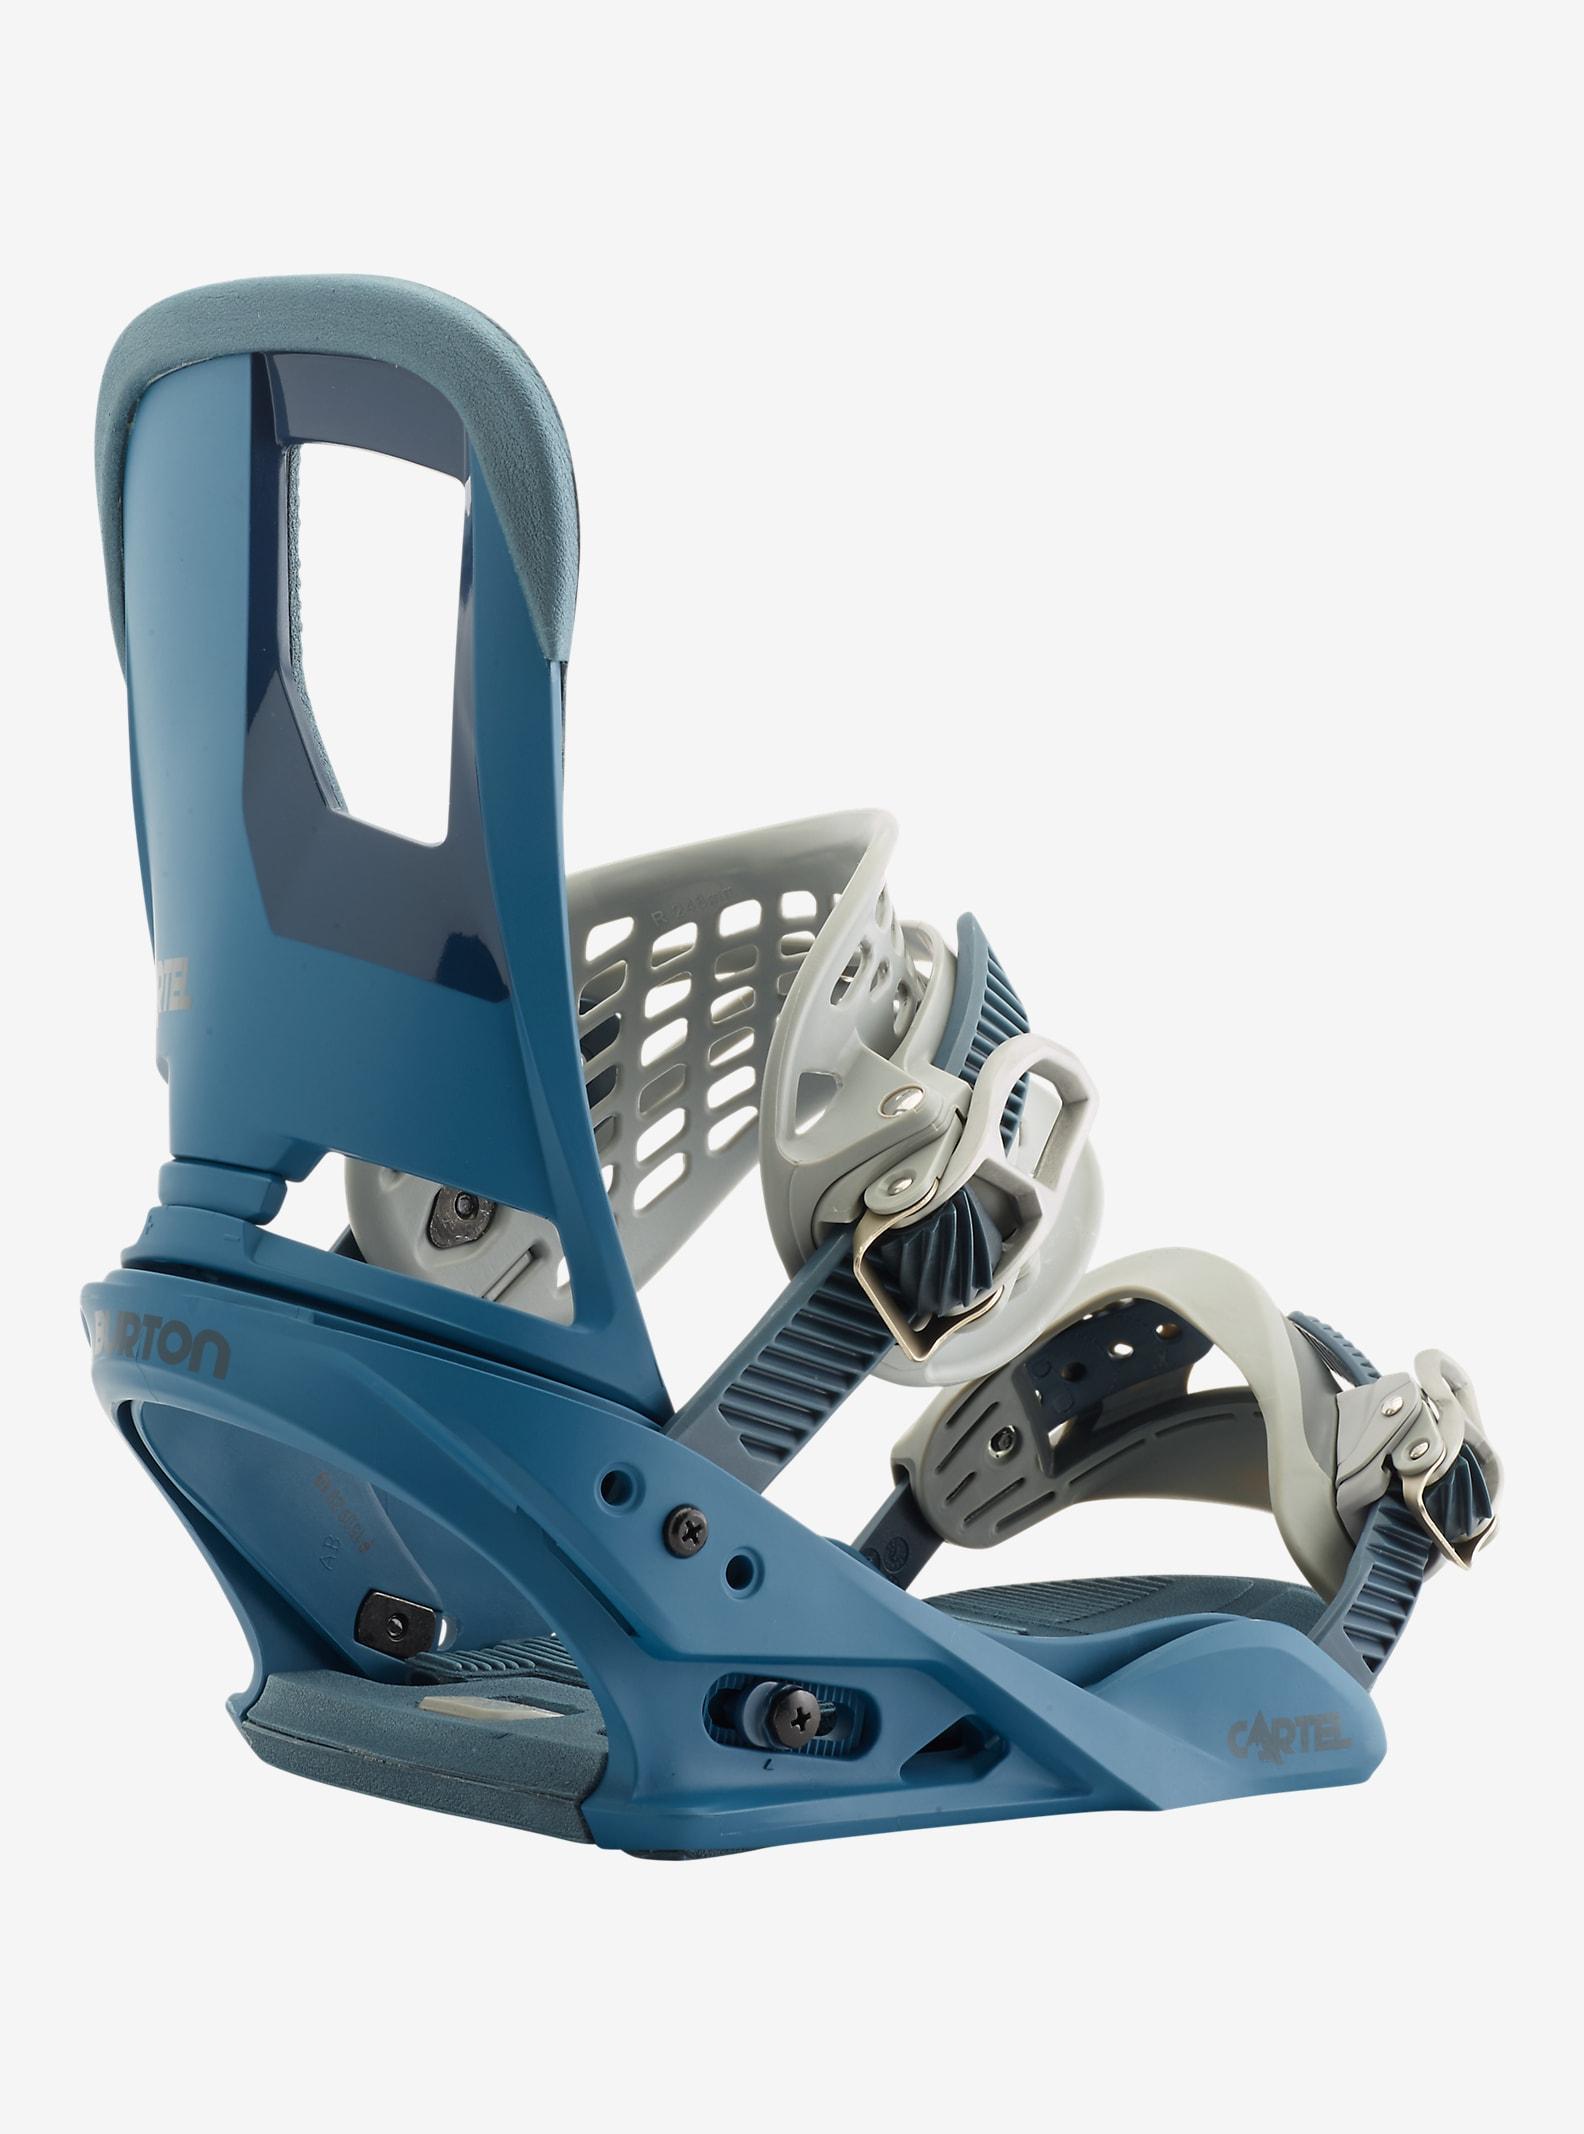 Burton Cartel Snowboardbindung angezeigt in Steel Blue